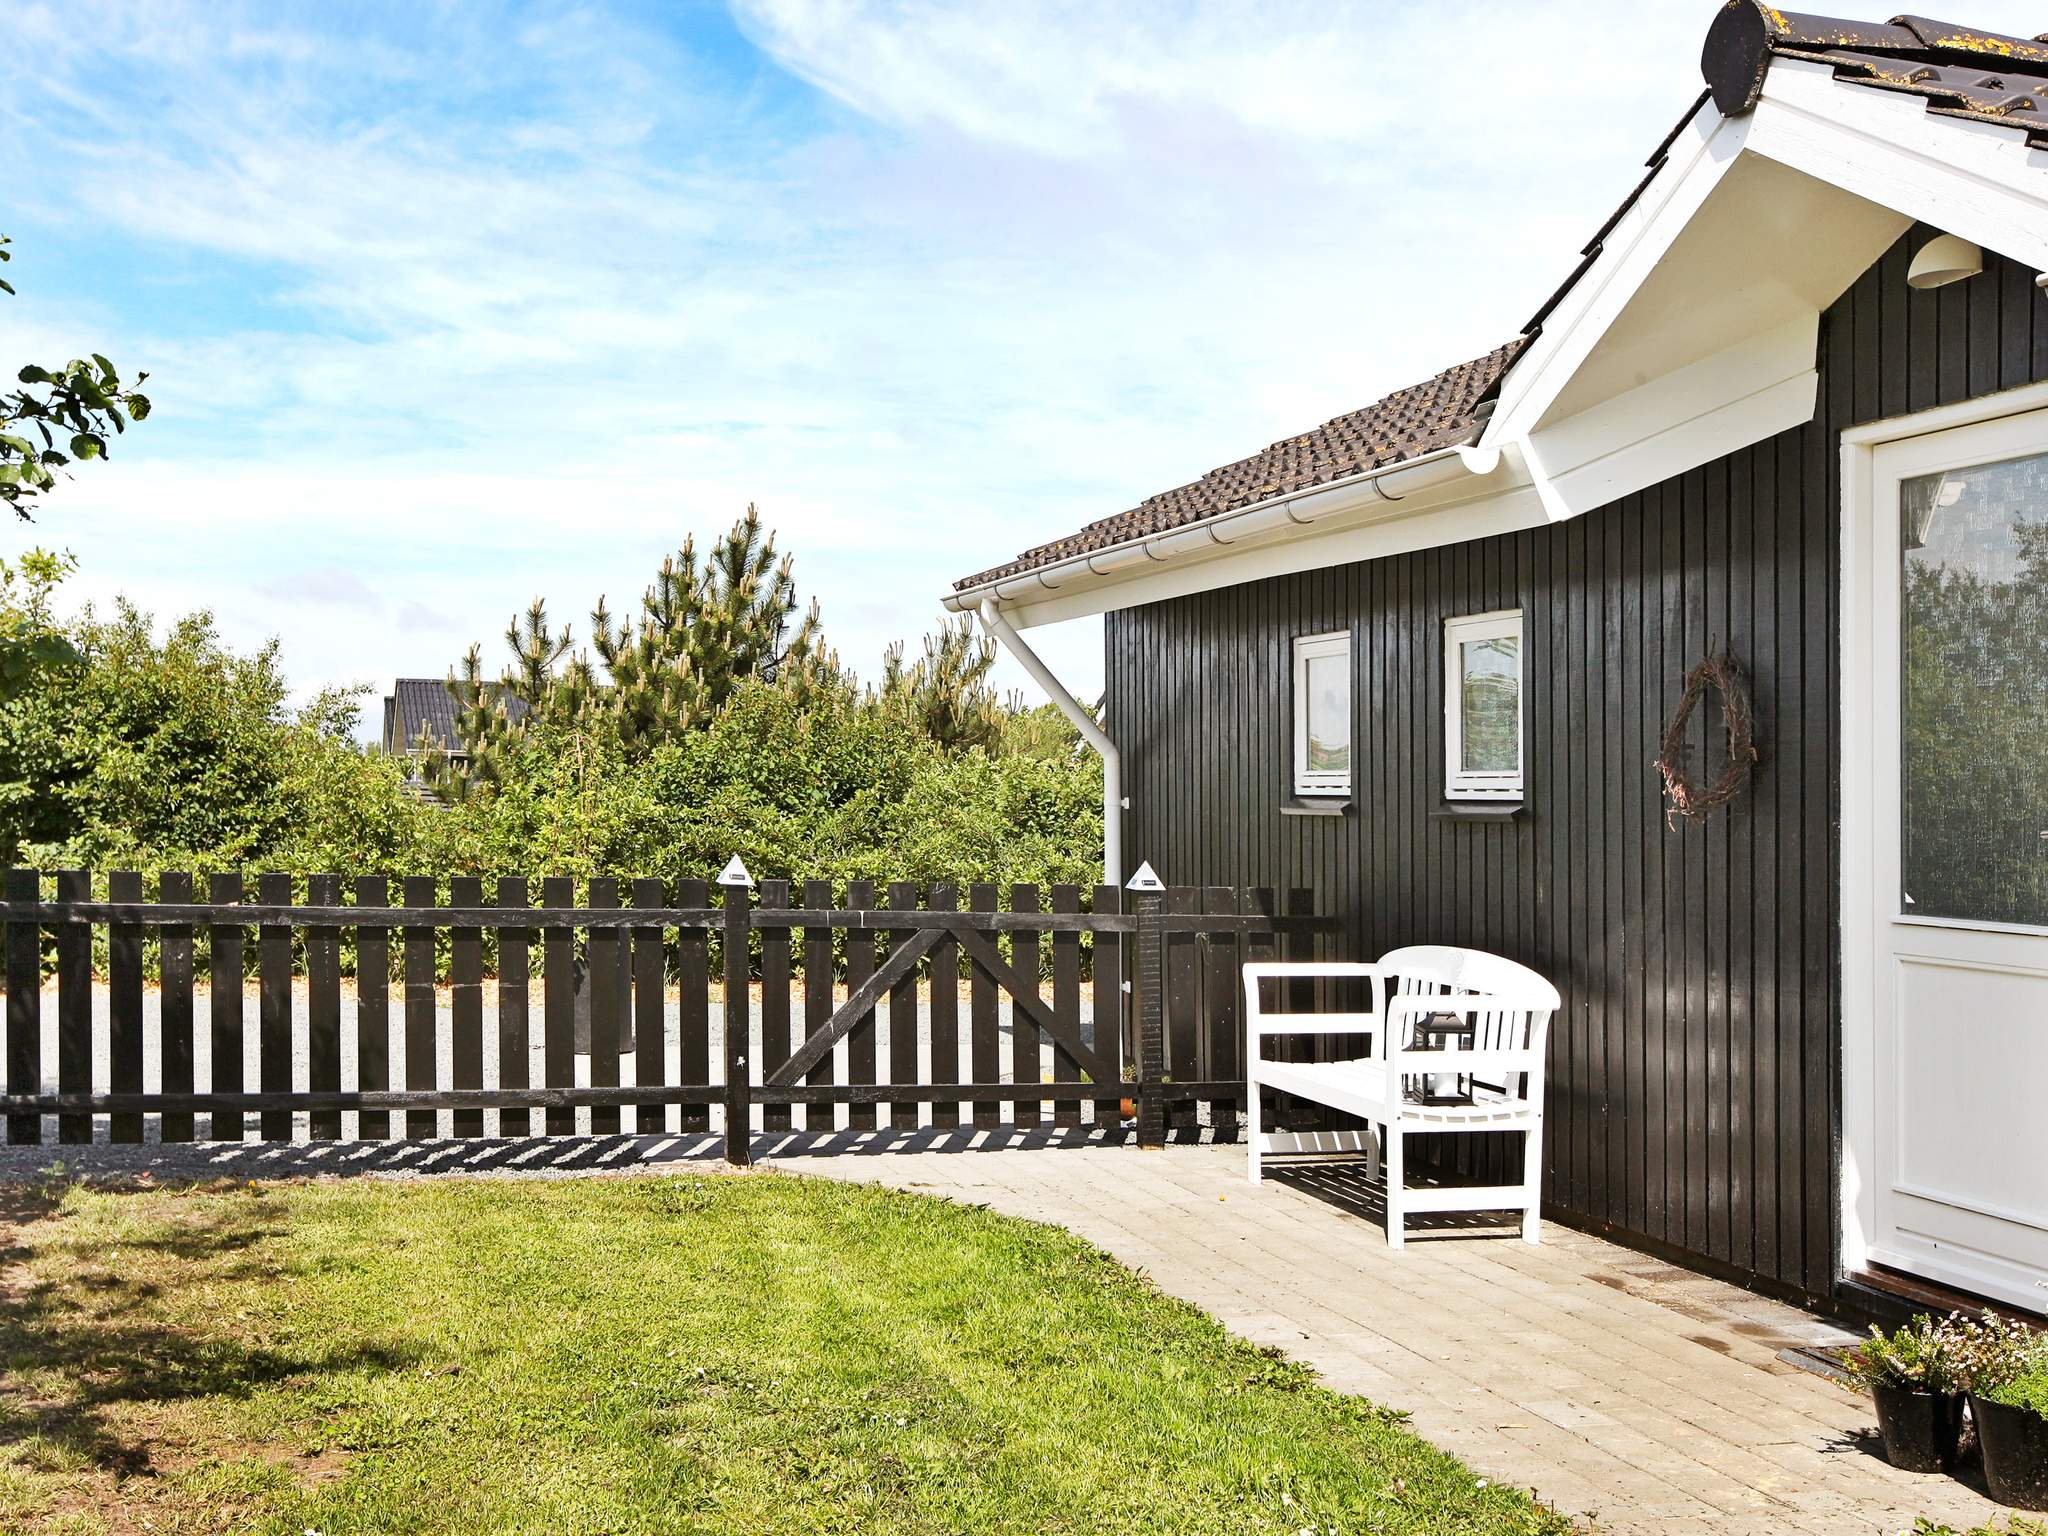 Ferienhaus Skaven Strand (1028954), Tarm, , Westjütland, Dänemark, Bild 16